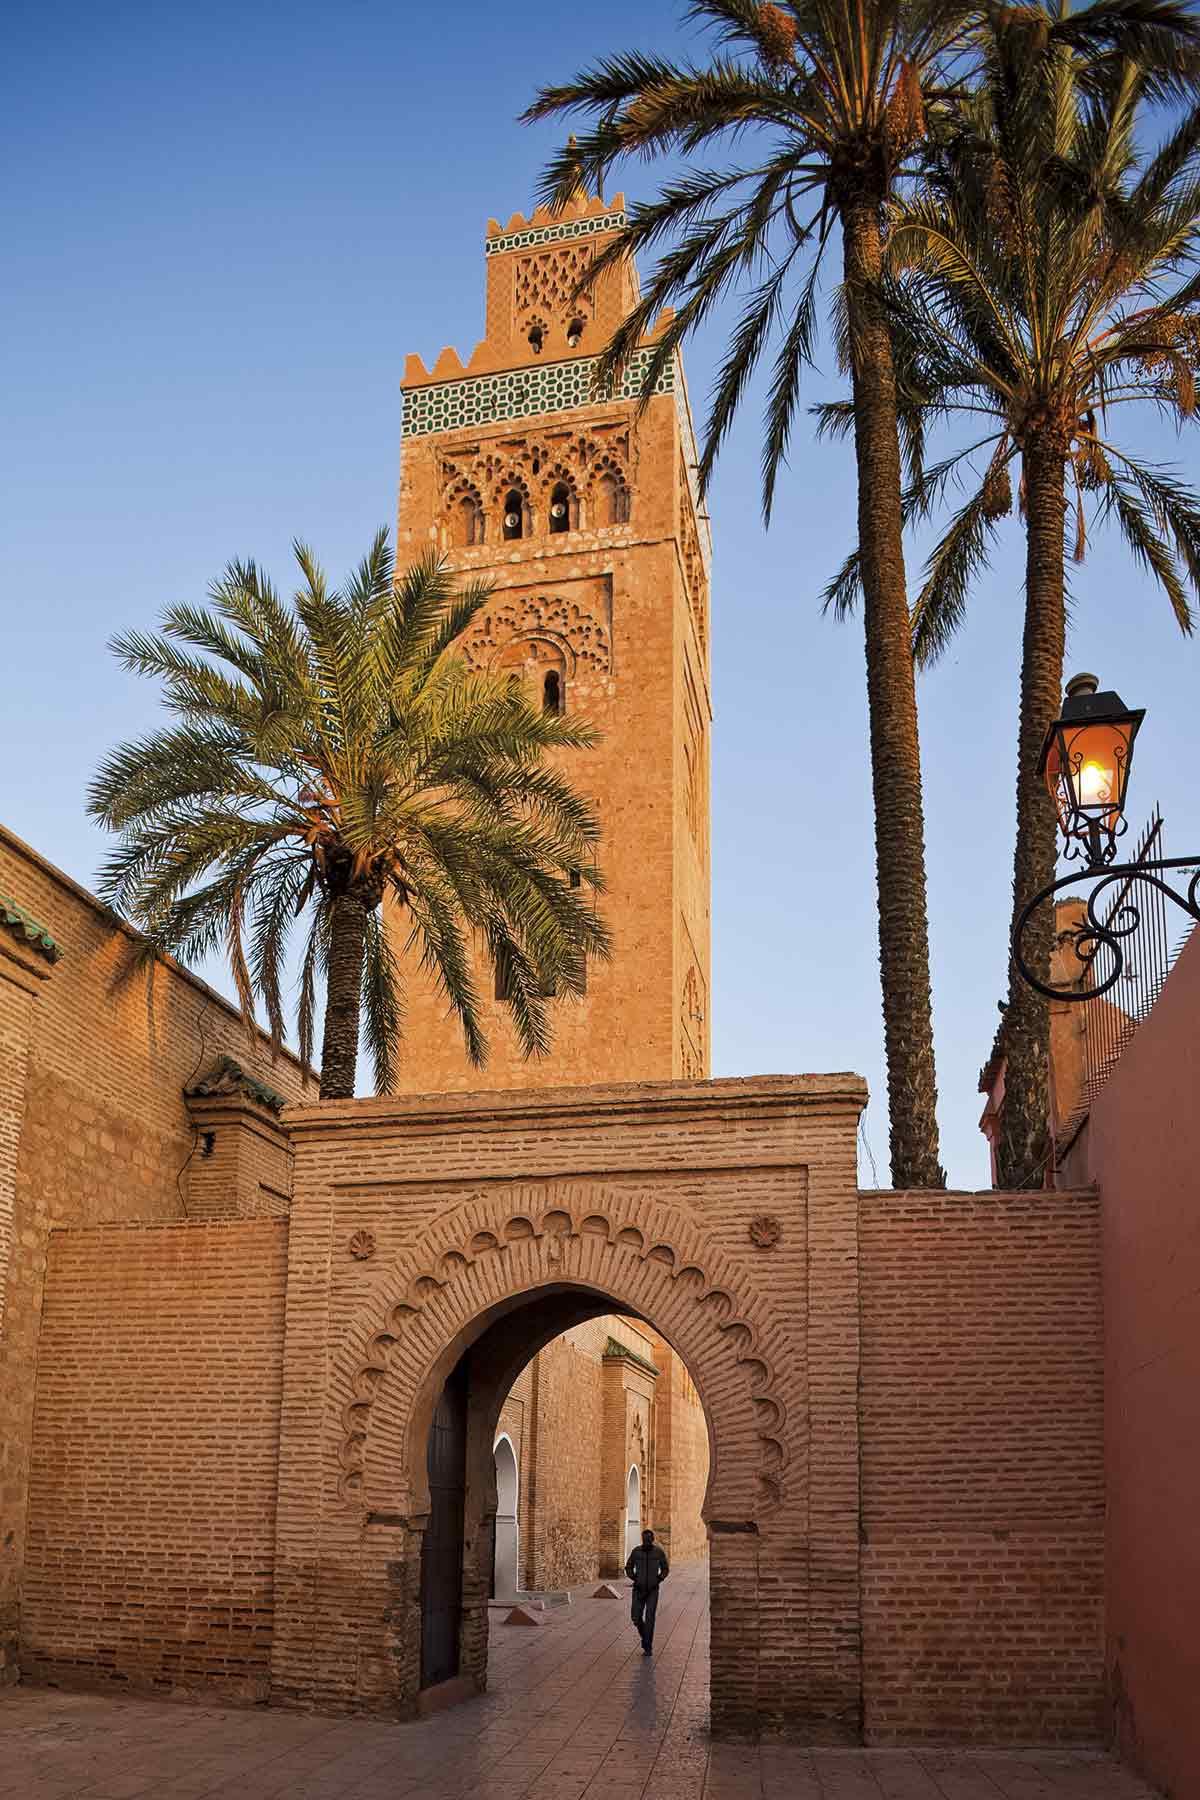 HEMIS 2102220. Mezquita la Kotubia